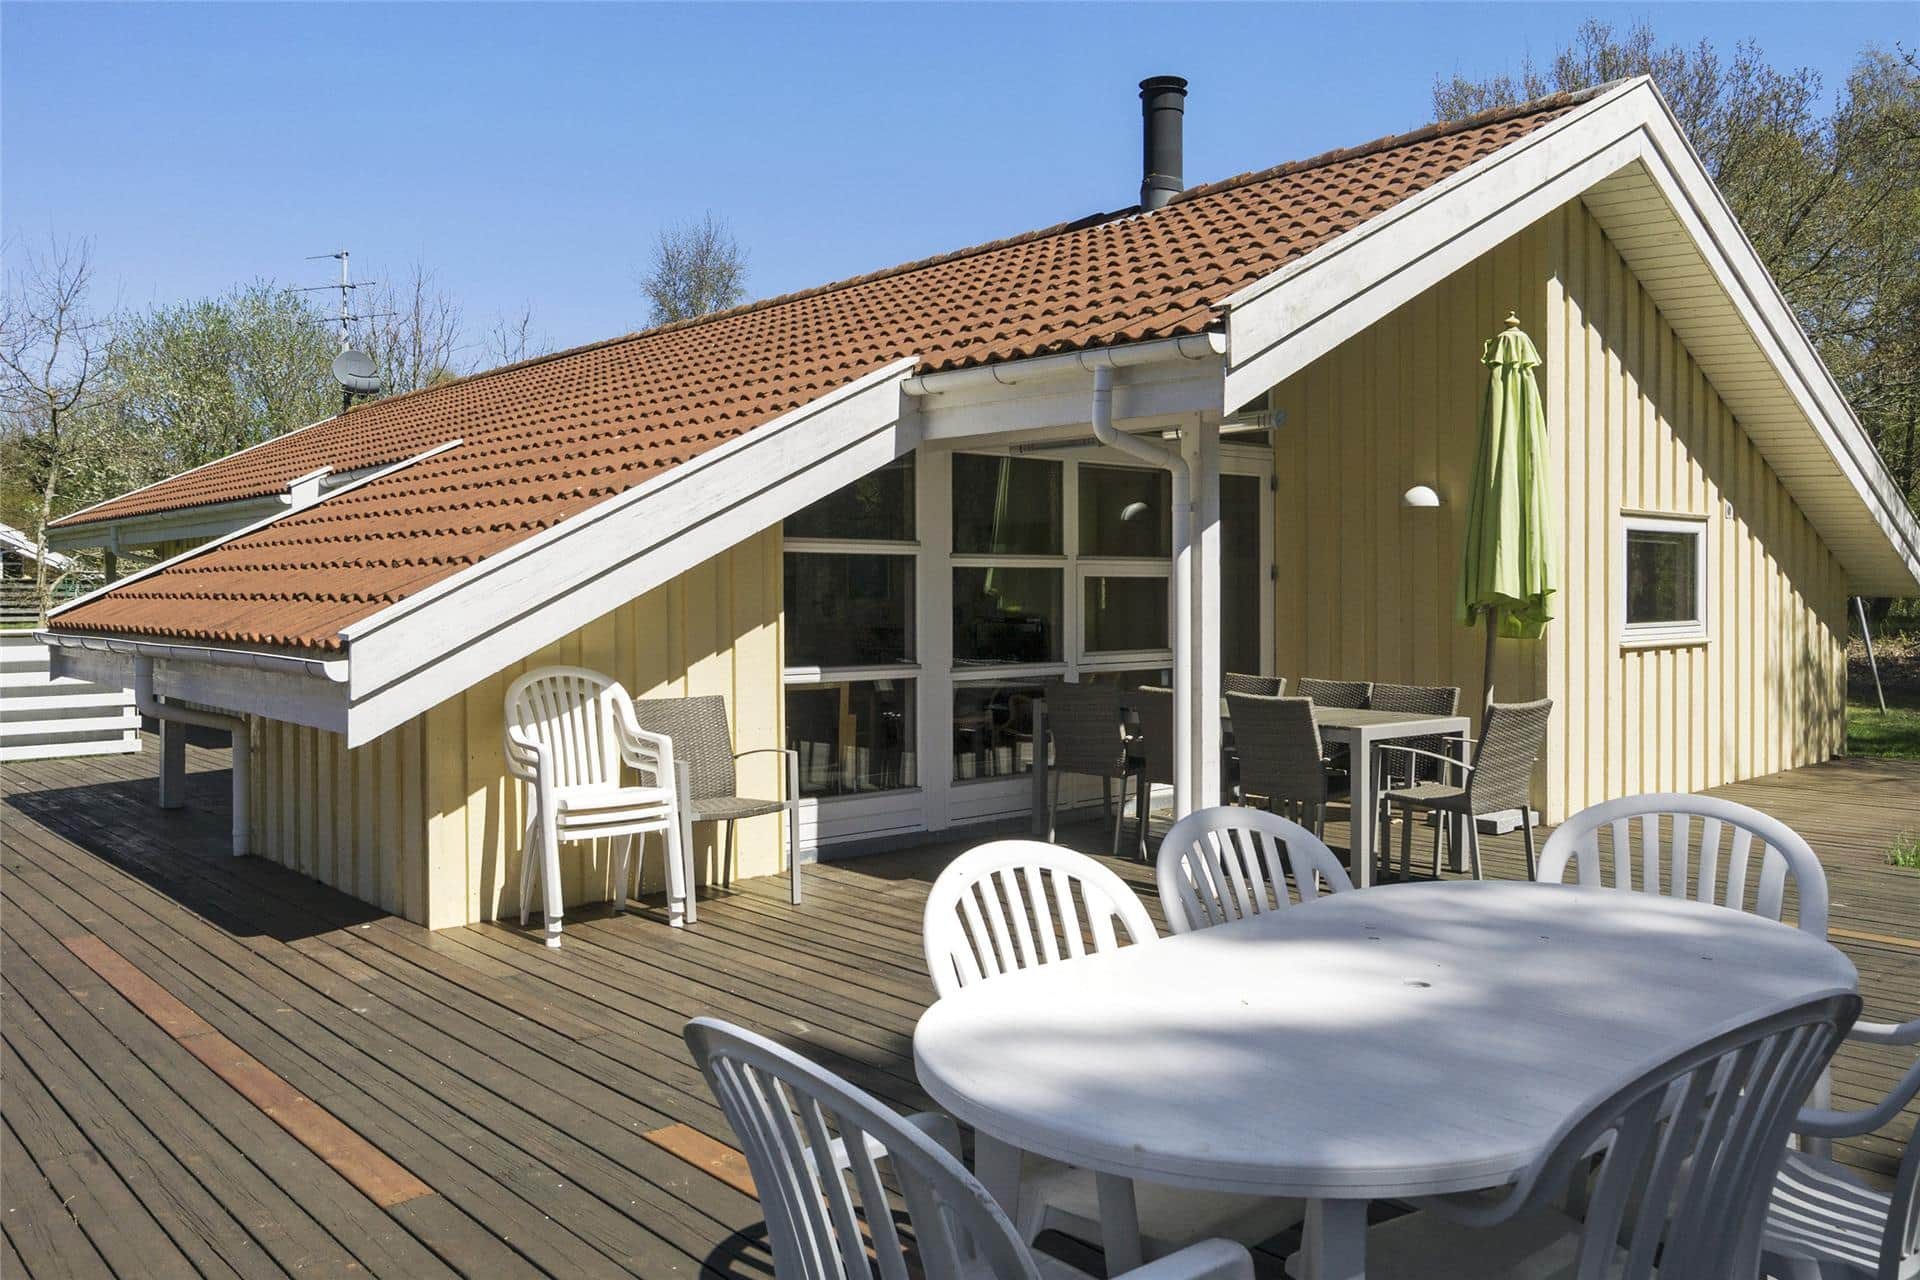 Billede 1-10 Sommerhus 1532, Strandparken 9, DK - 3720 Aakirkeby